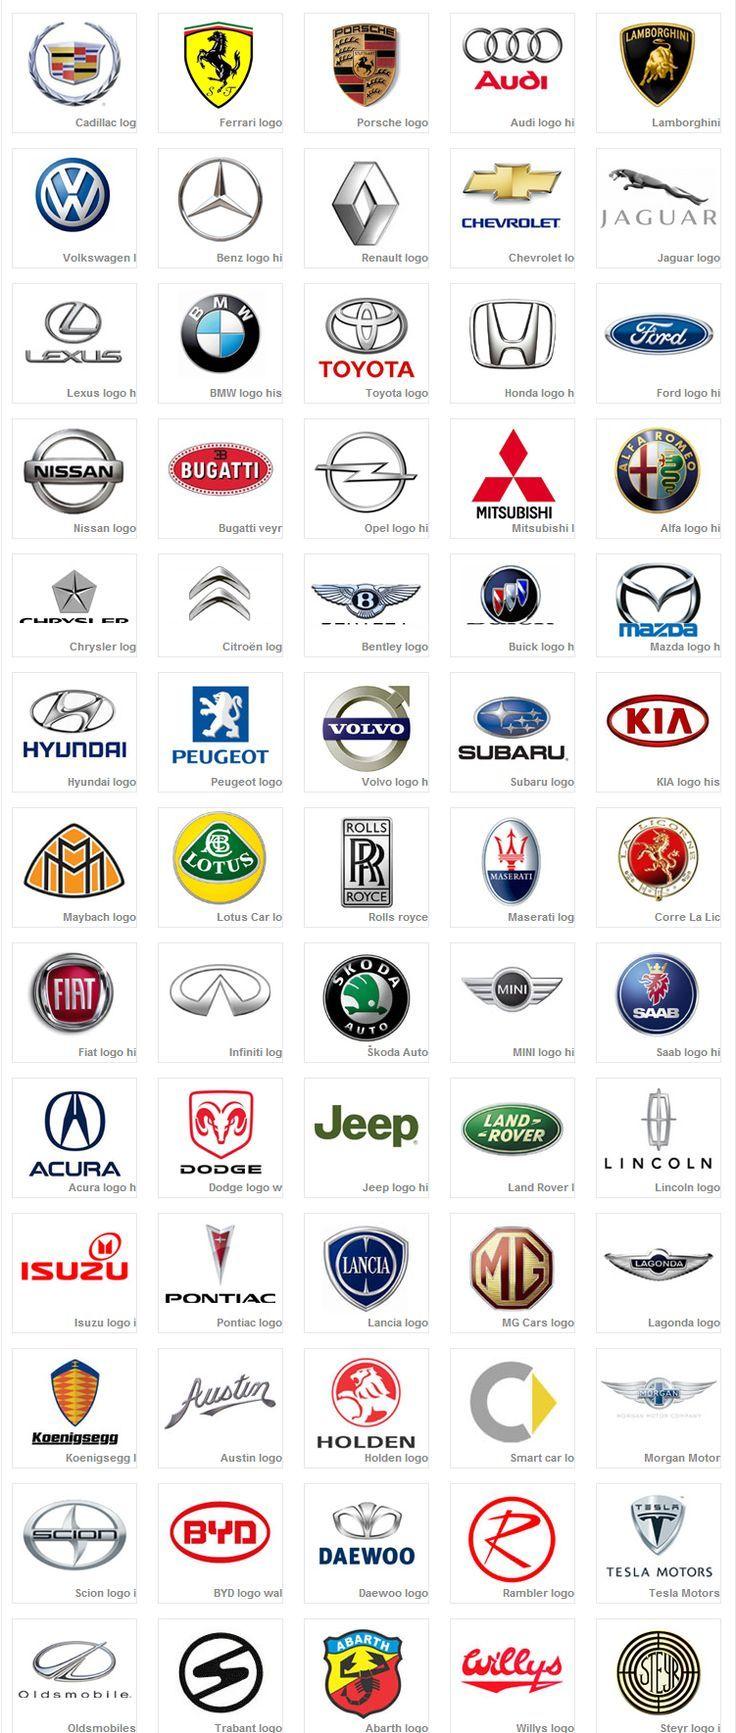 Car Logos Automundo 2 Motores Y Turismo Pinterest Luxury